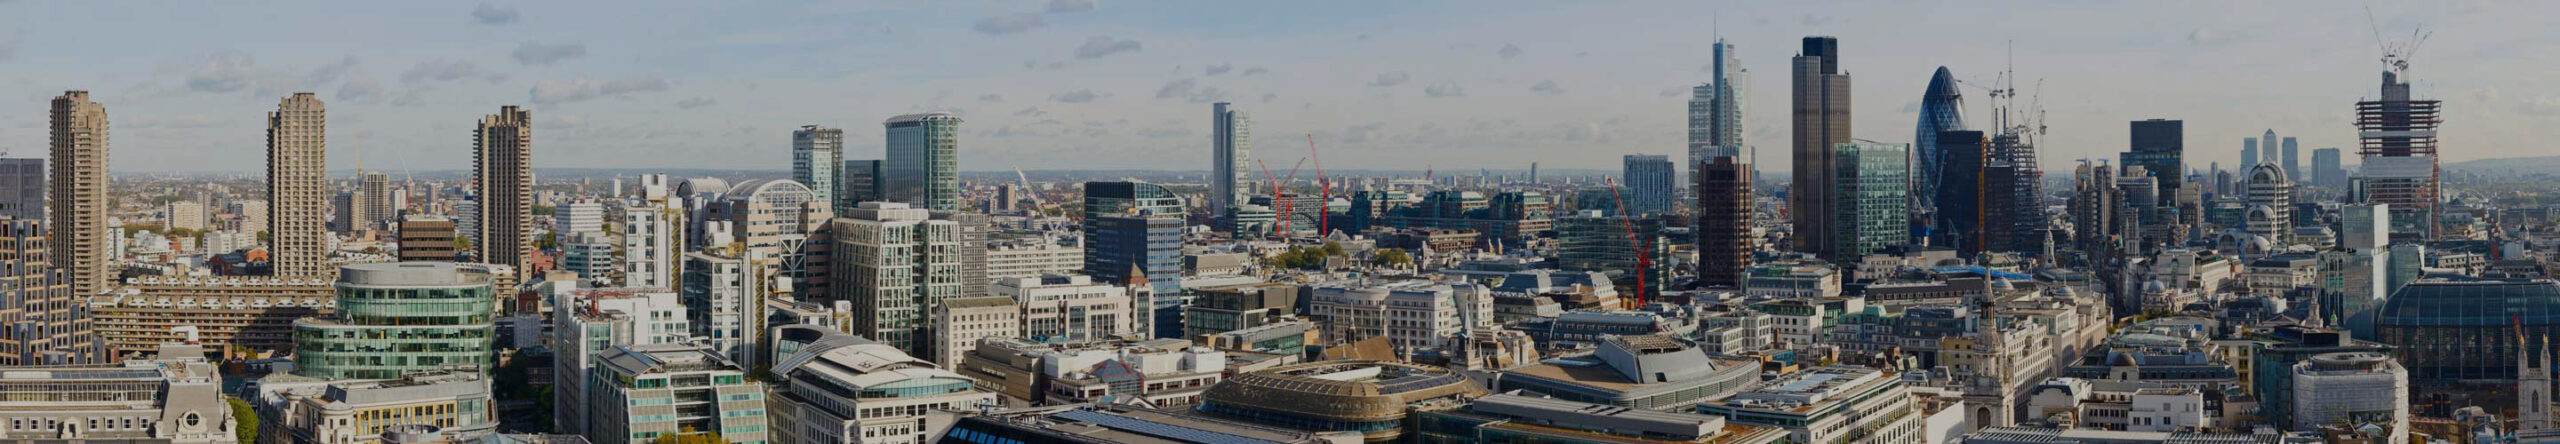 Bastelvorlage London - Panorama London, UK - Architektur London - Skyline London - London Hochhäuser - Architektur basteln